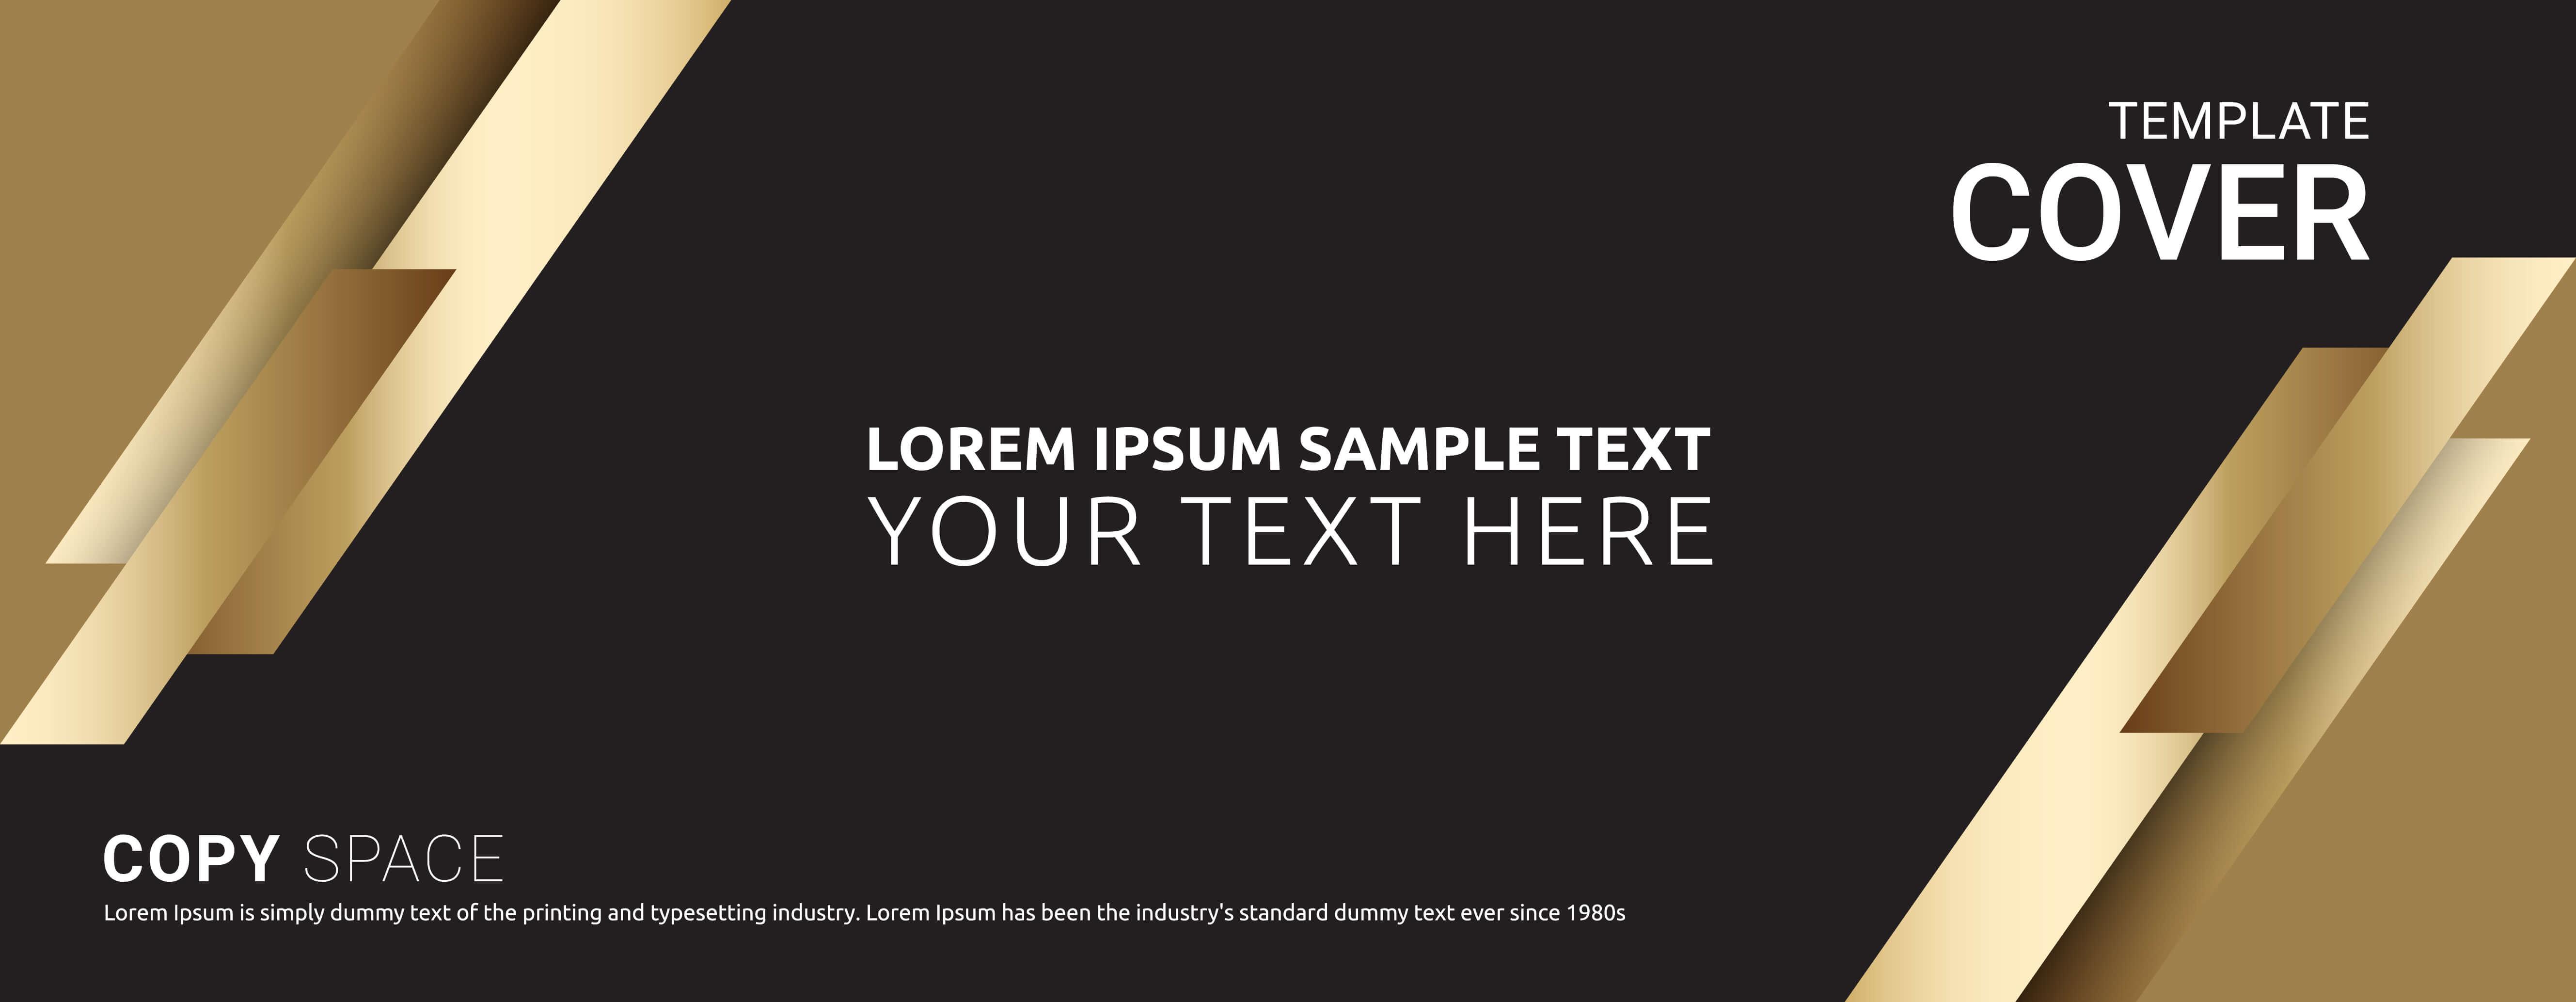 Cover Design Template. Leaflet Advertising, Vinyl Banner With Regard To Vinyl Banner Design Templates